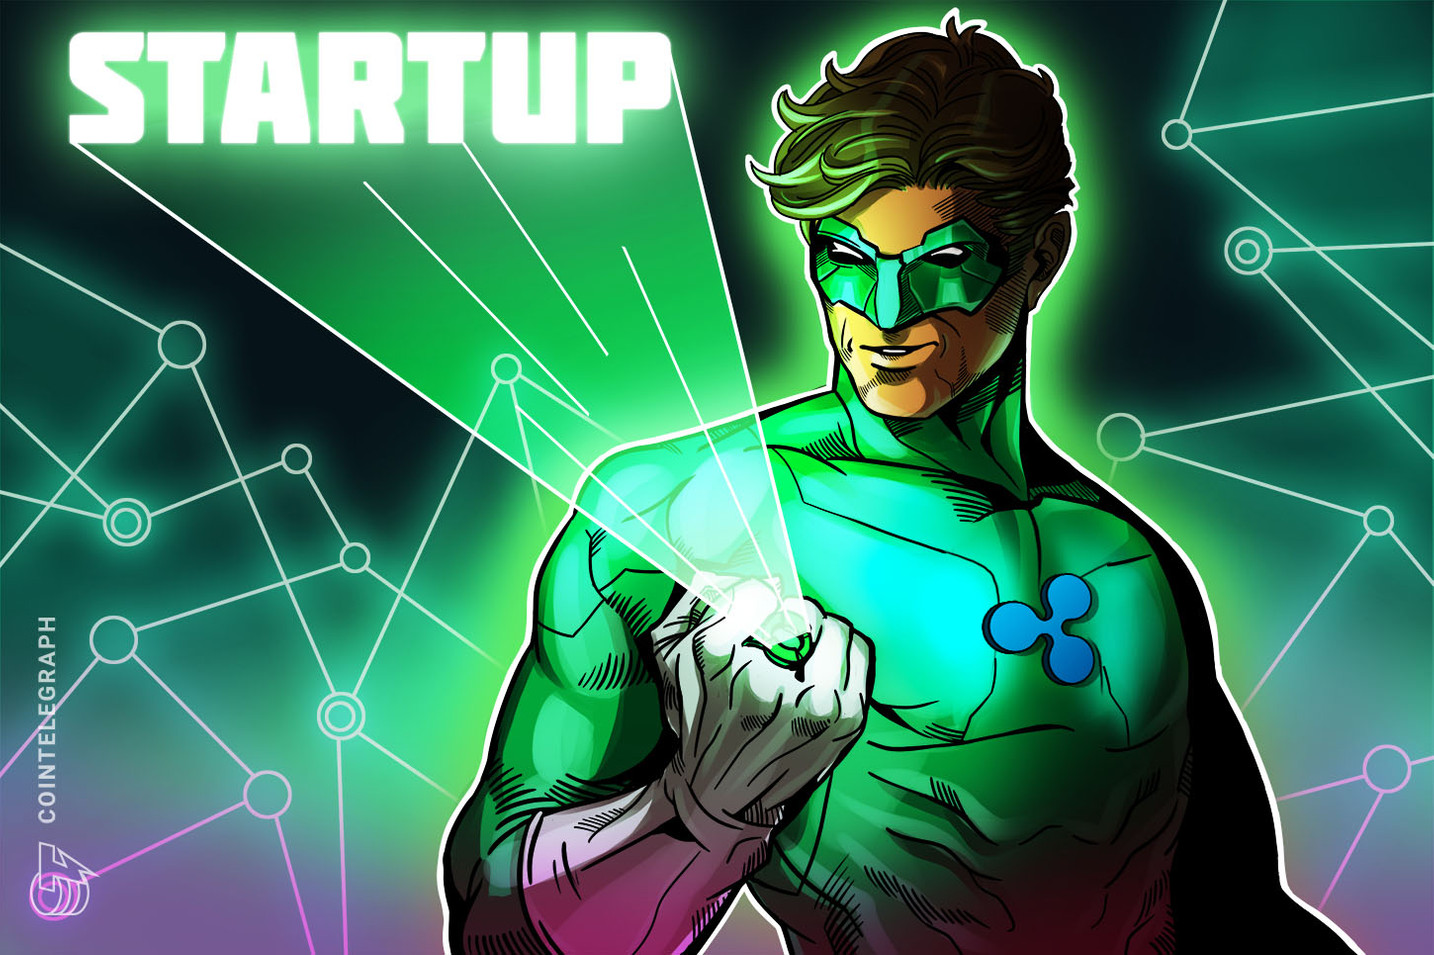 XRPウォレットのファームウェア開発へ リップルの投資部門Xpringがスウェーデンのウォレット企業に投資【ニュース】